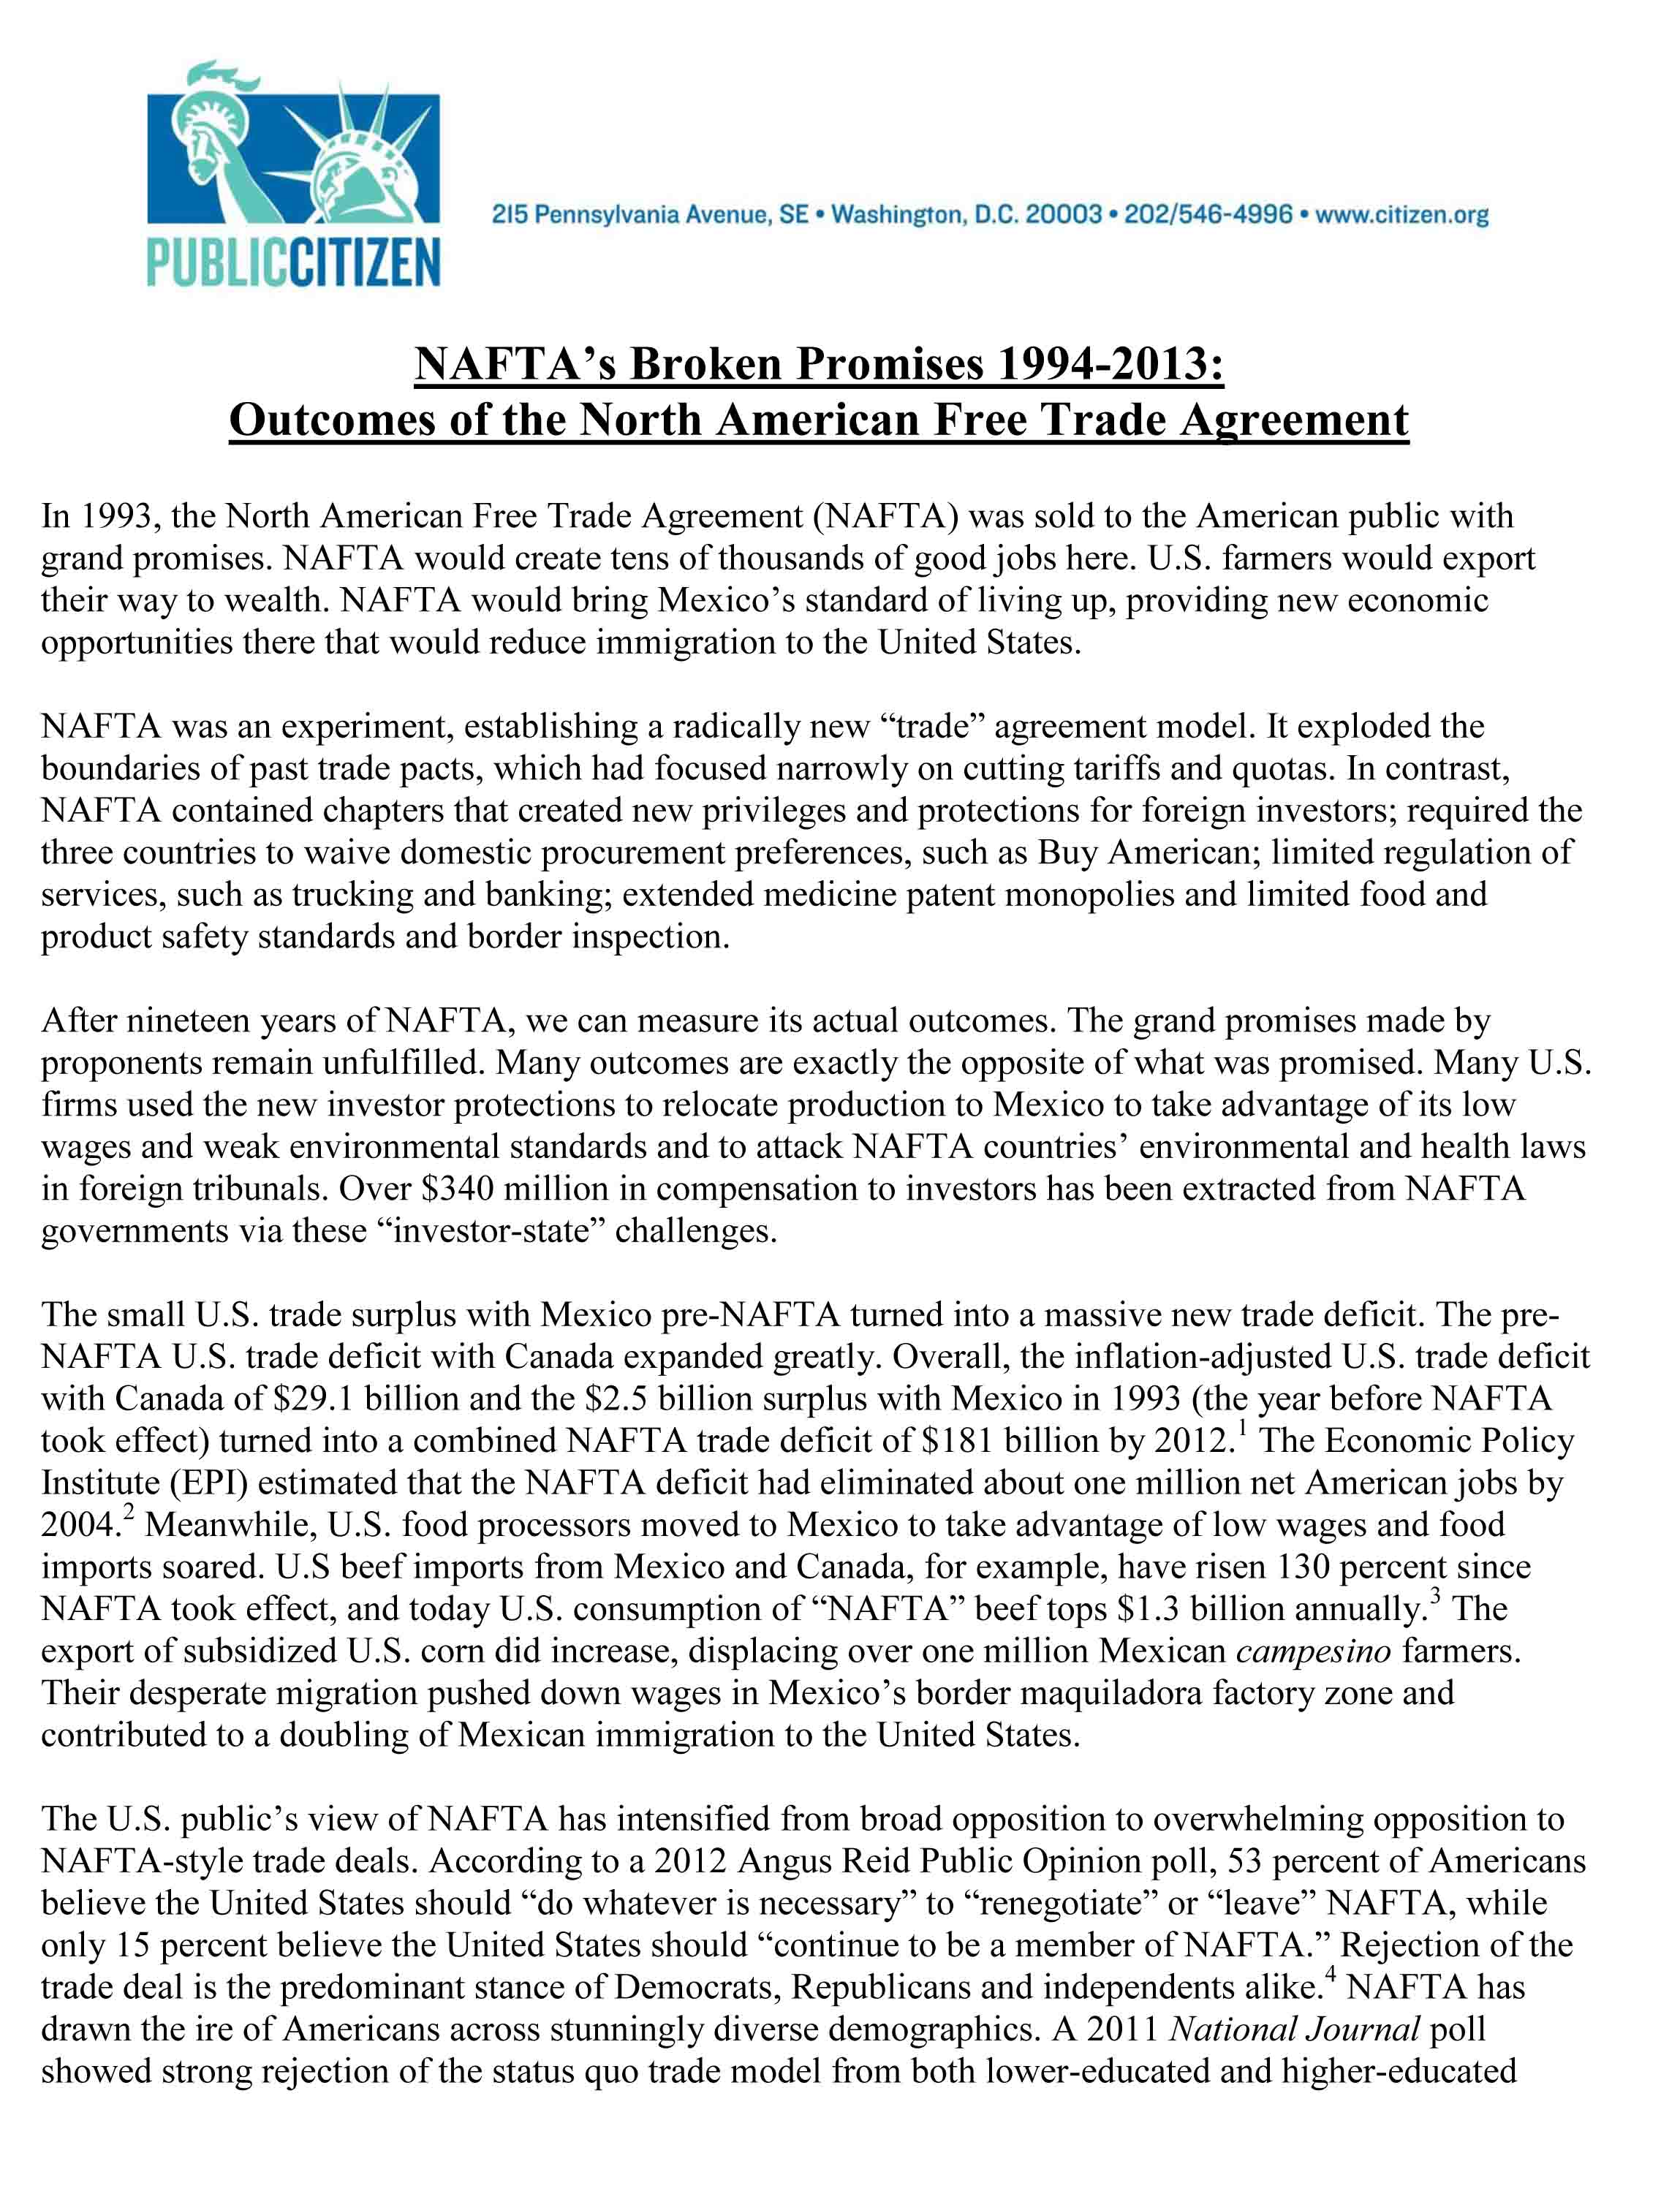 NAFTA Facts